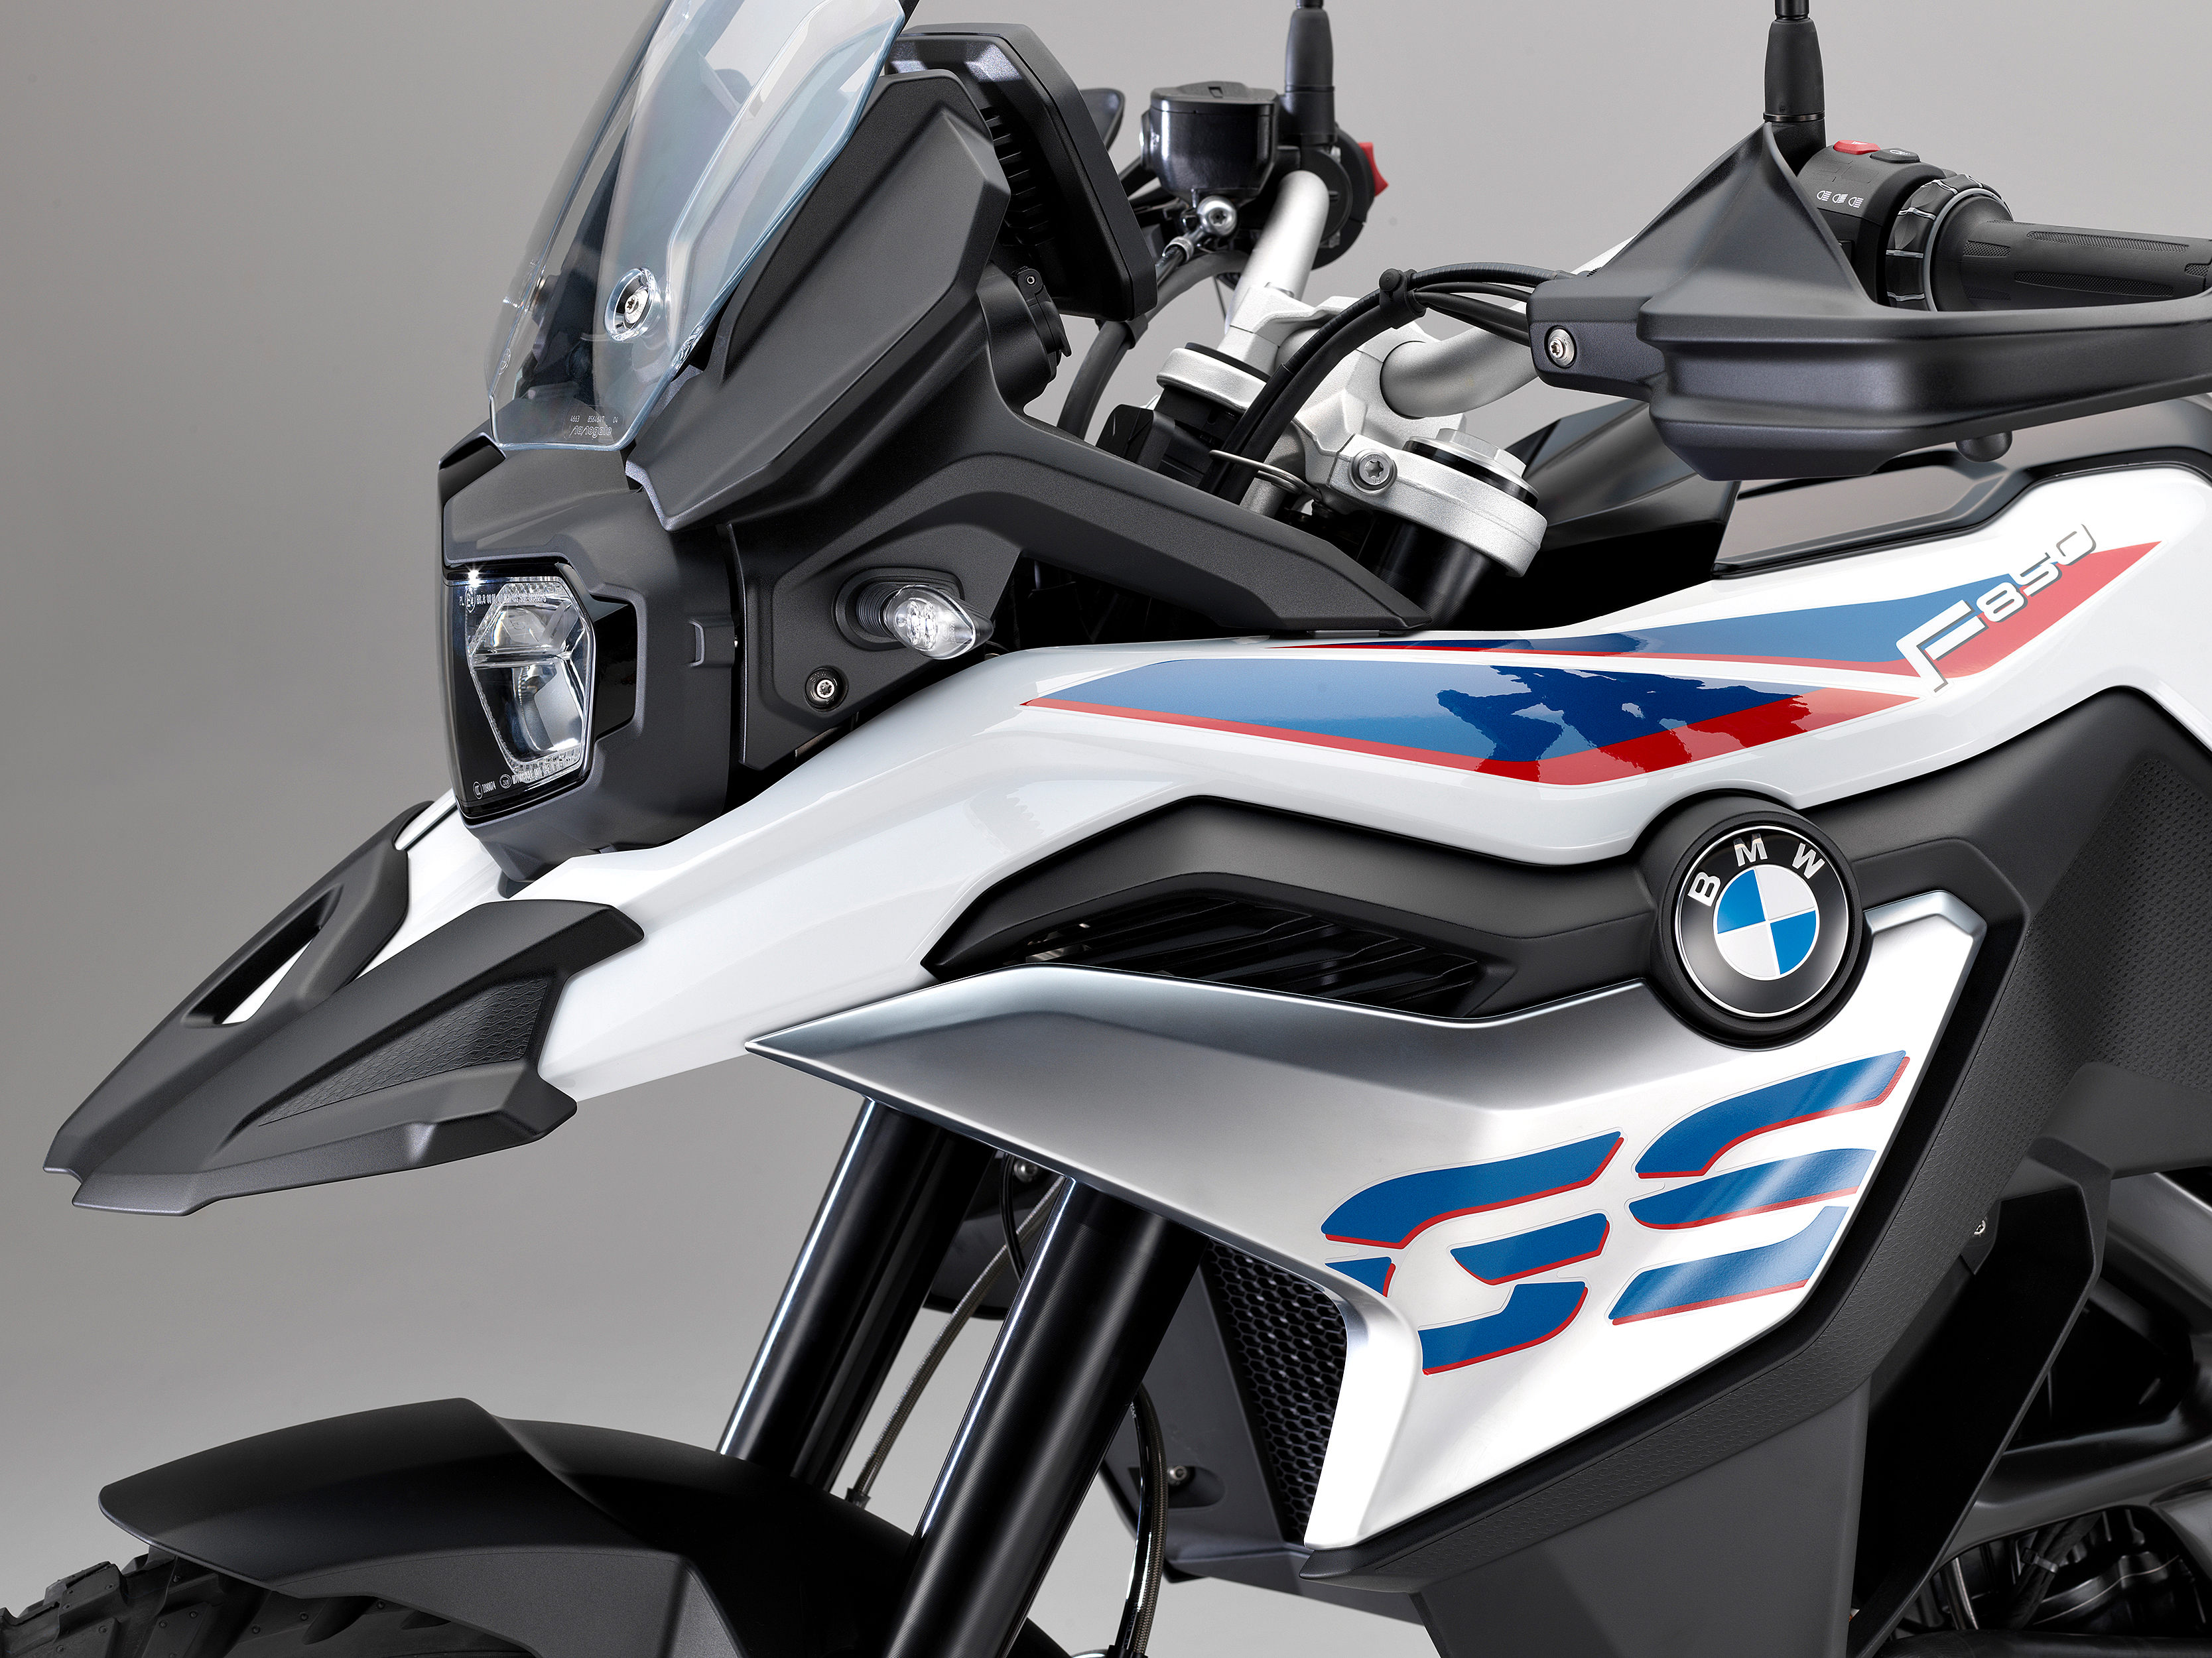 Prueba BMW 850 GS 2018 presentación MotorADN fotos prensa (129)